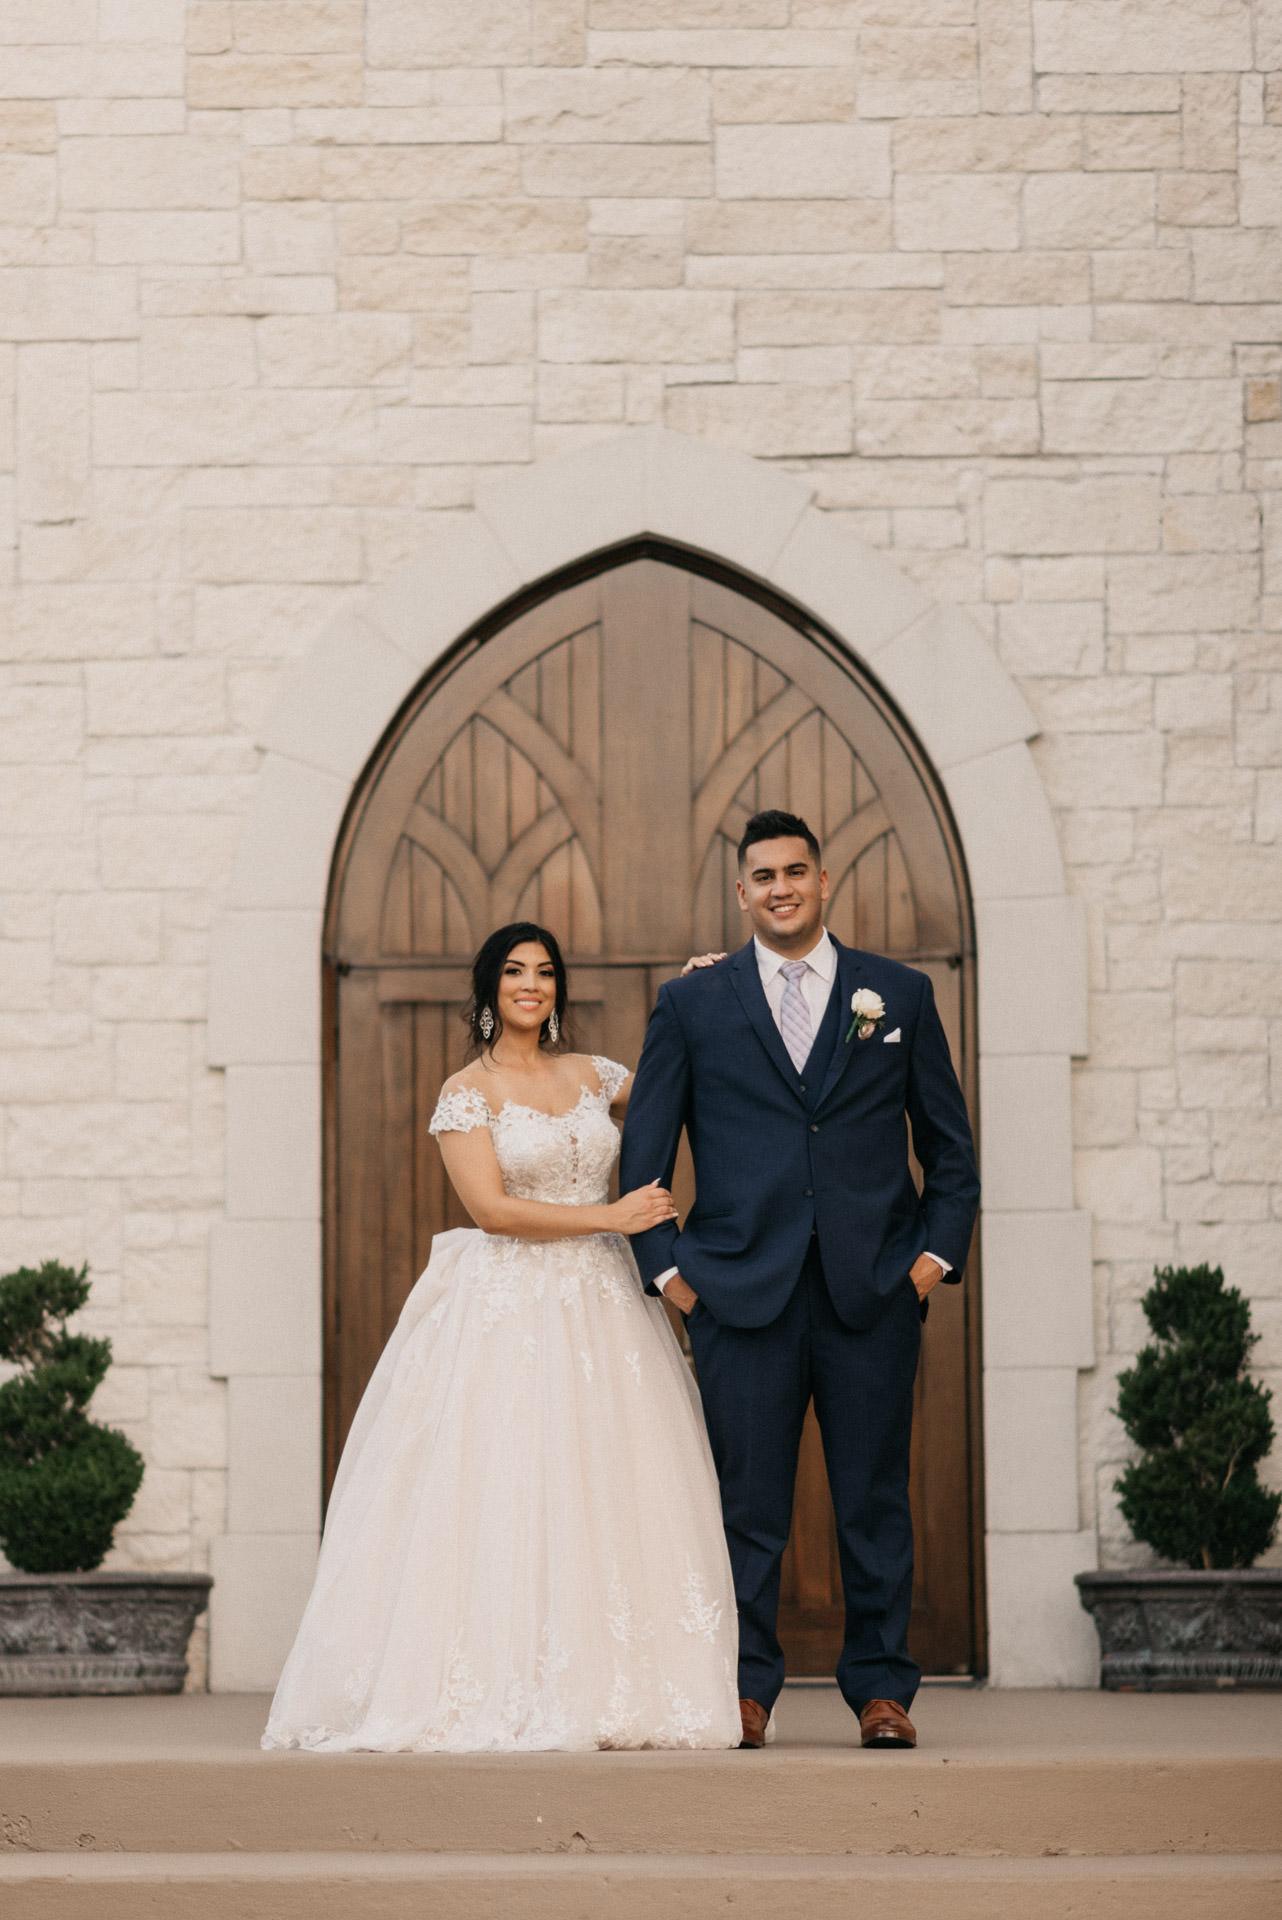 lexi-michael-wedding-blog-sm-108.jpg